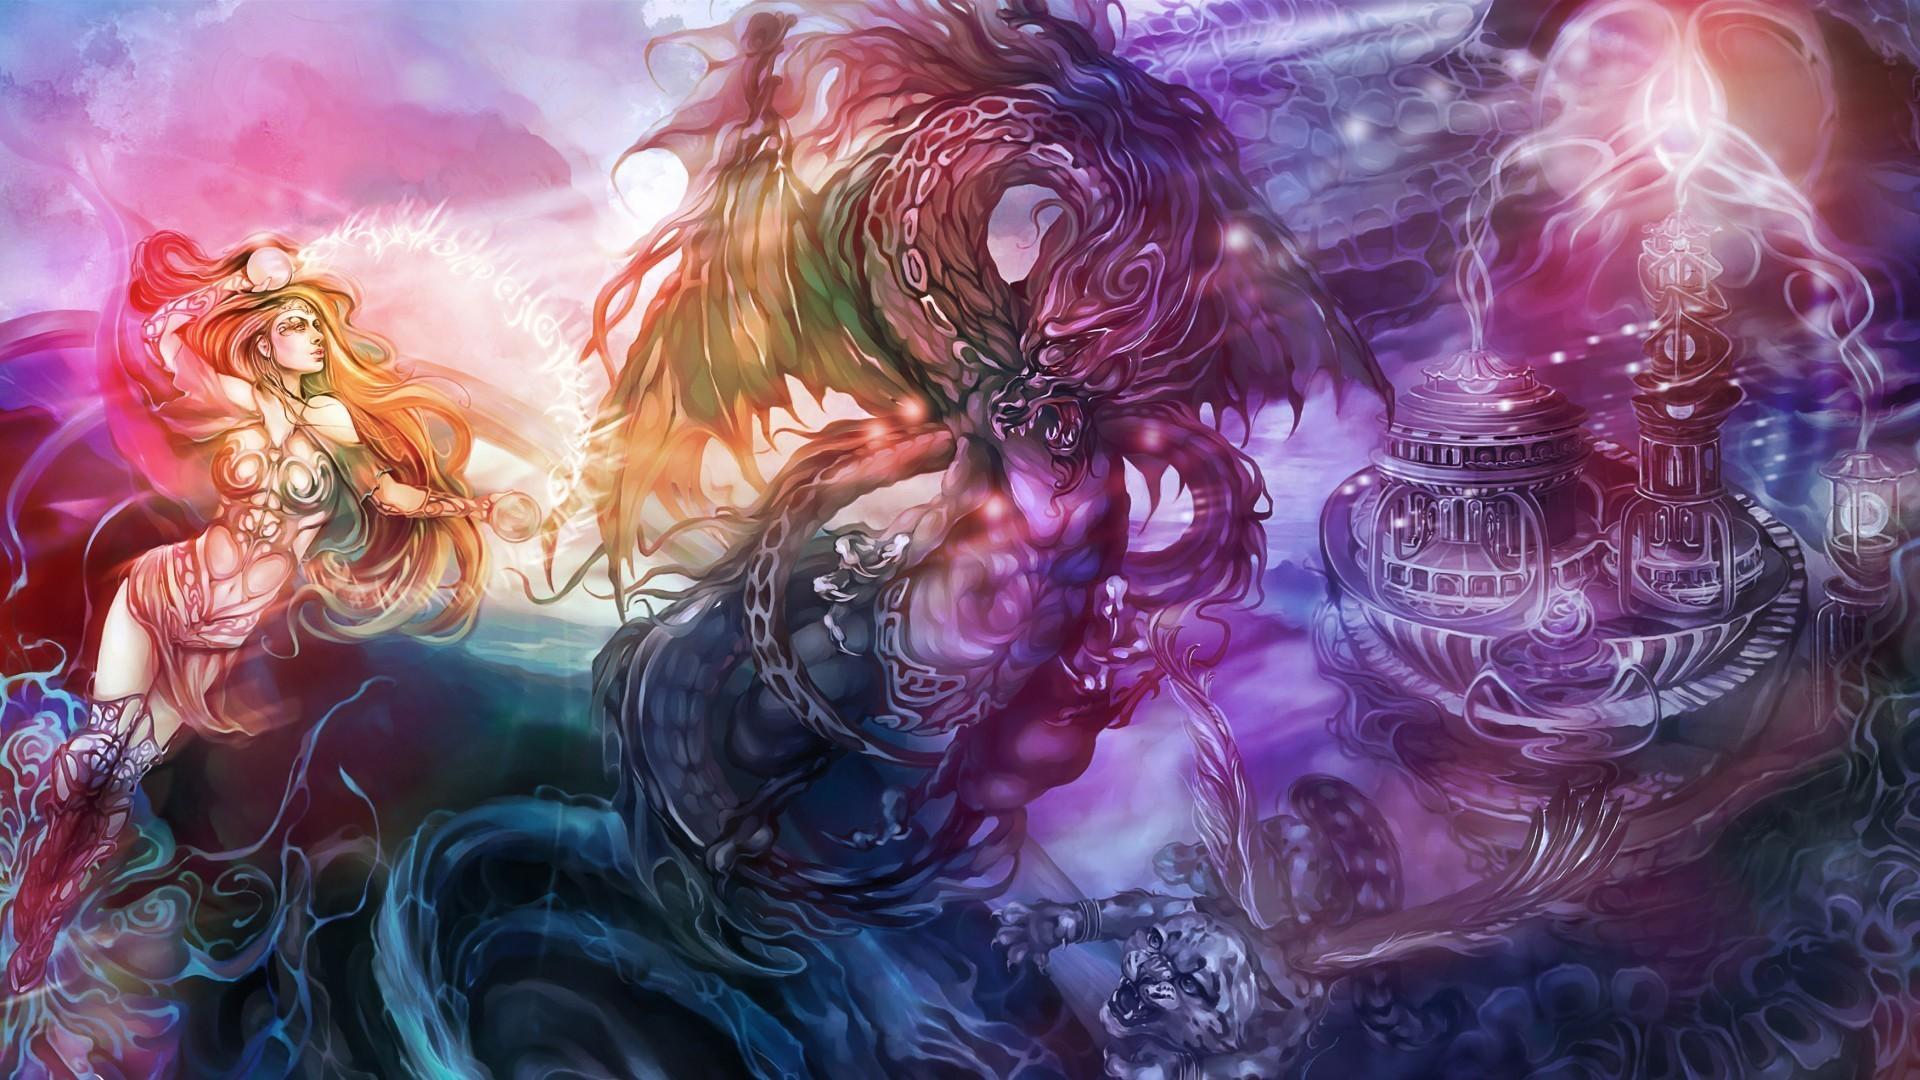 Res: 1920x1080,  Gothic Art Dragon Screensaver | fantasy art dragon magic women  females girls castle dark wallpaper